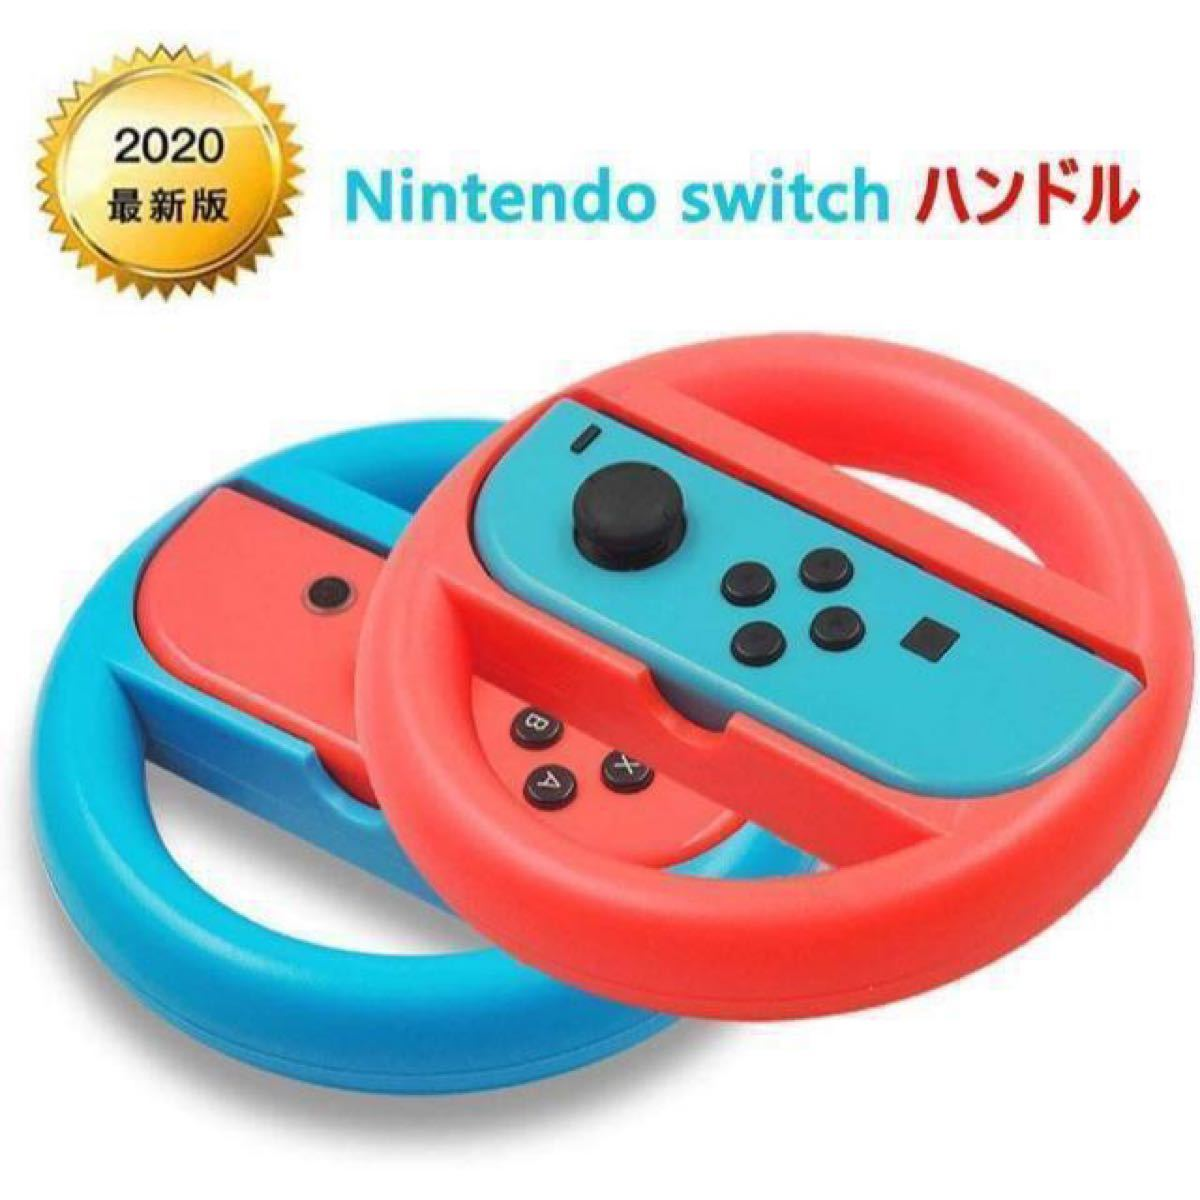 Nintendo Switch マリオカート8デラックス Nintendo